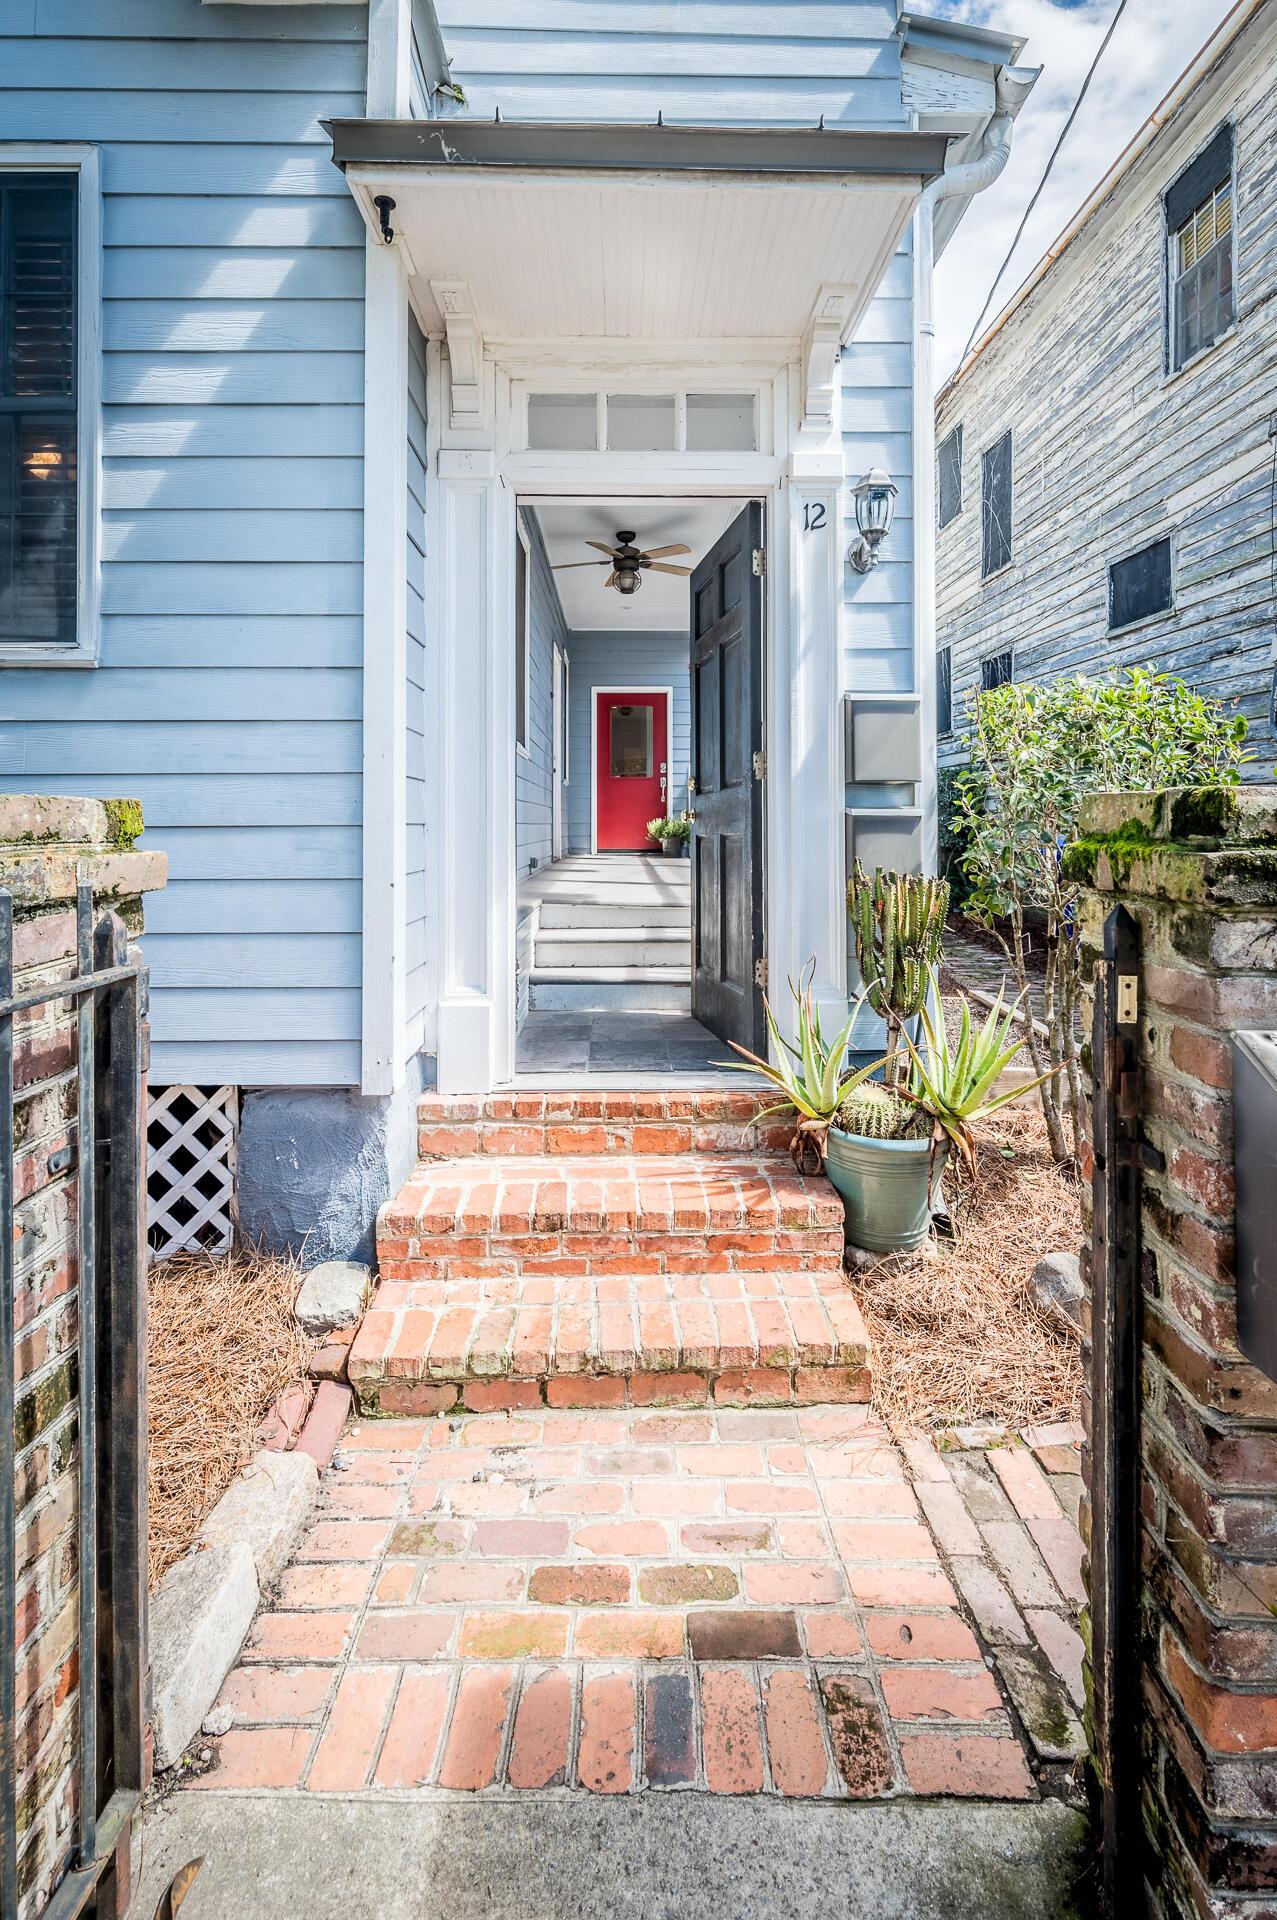 12 Killians Street Charleston, SC 29403